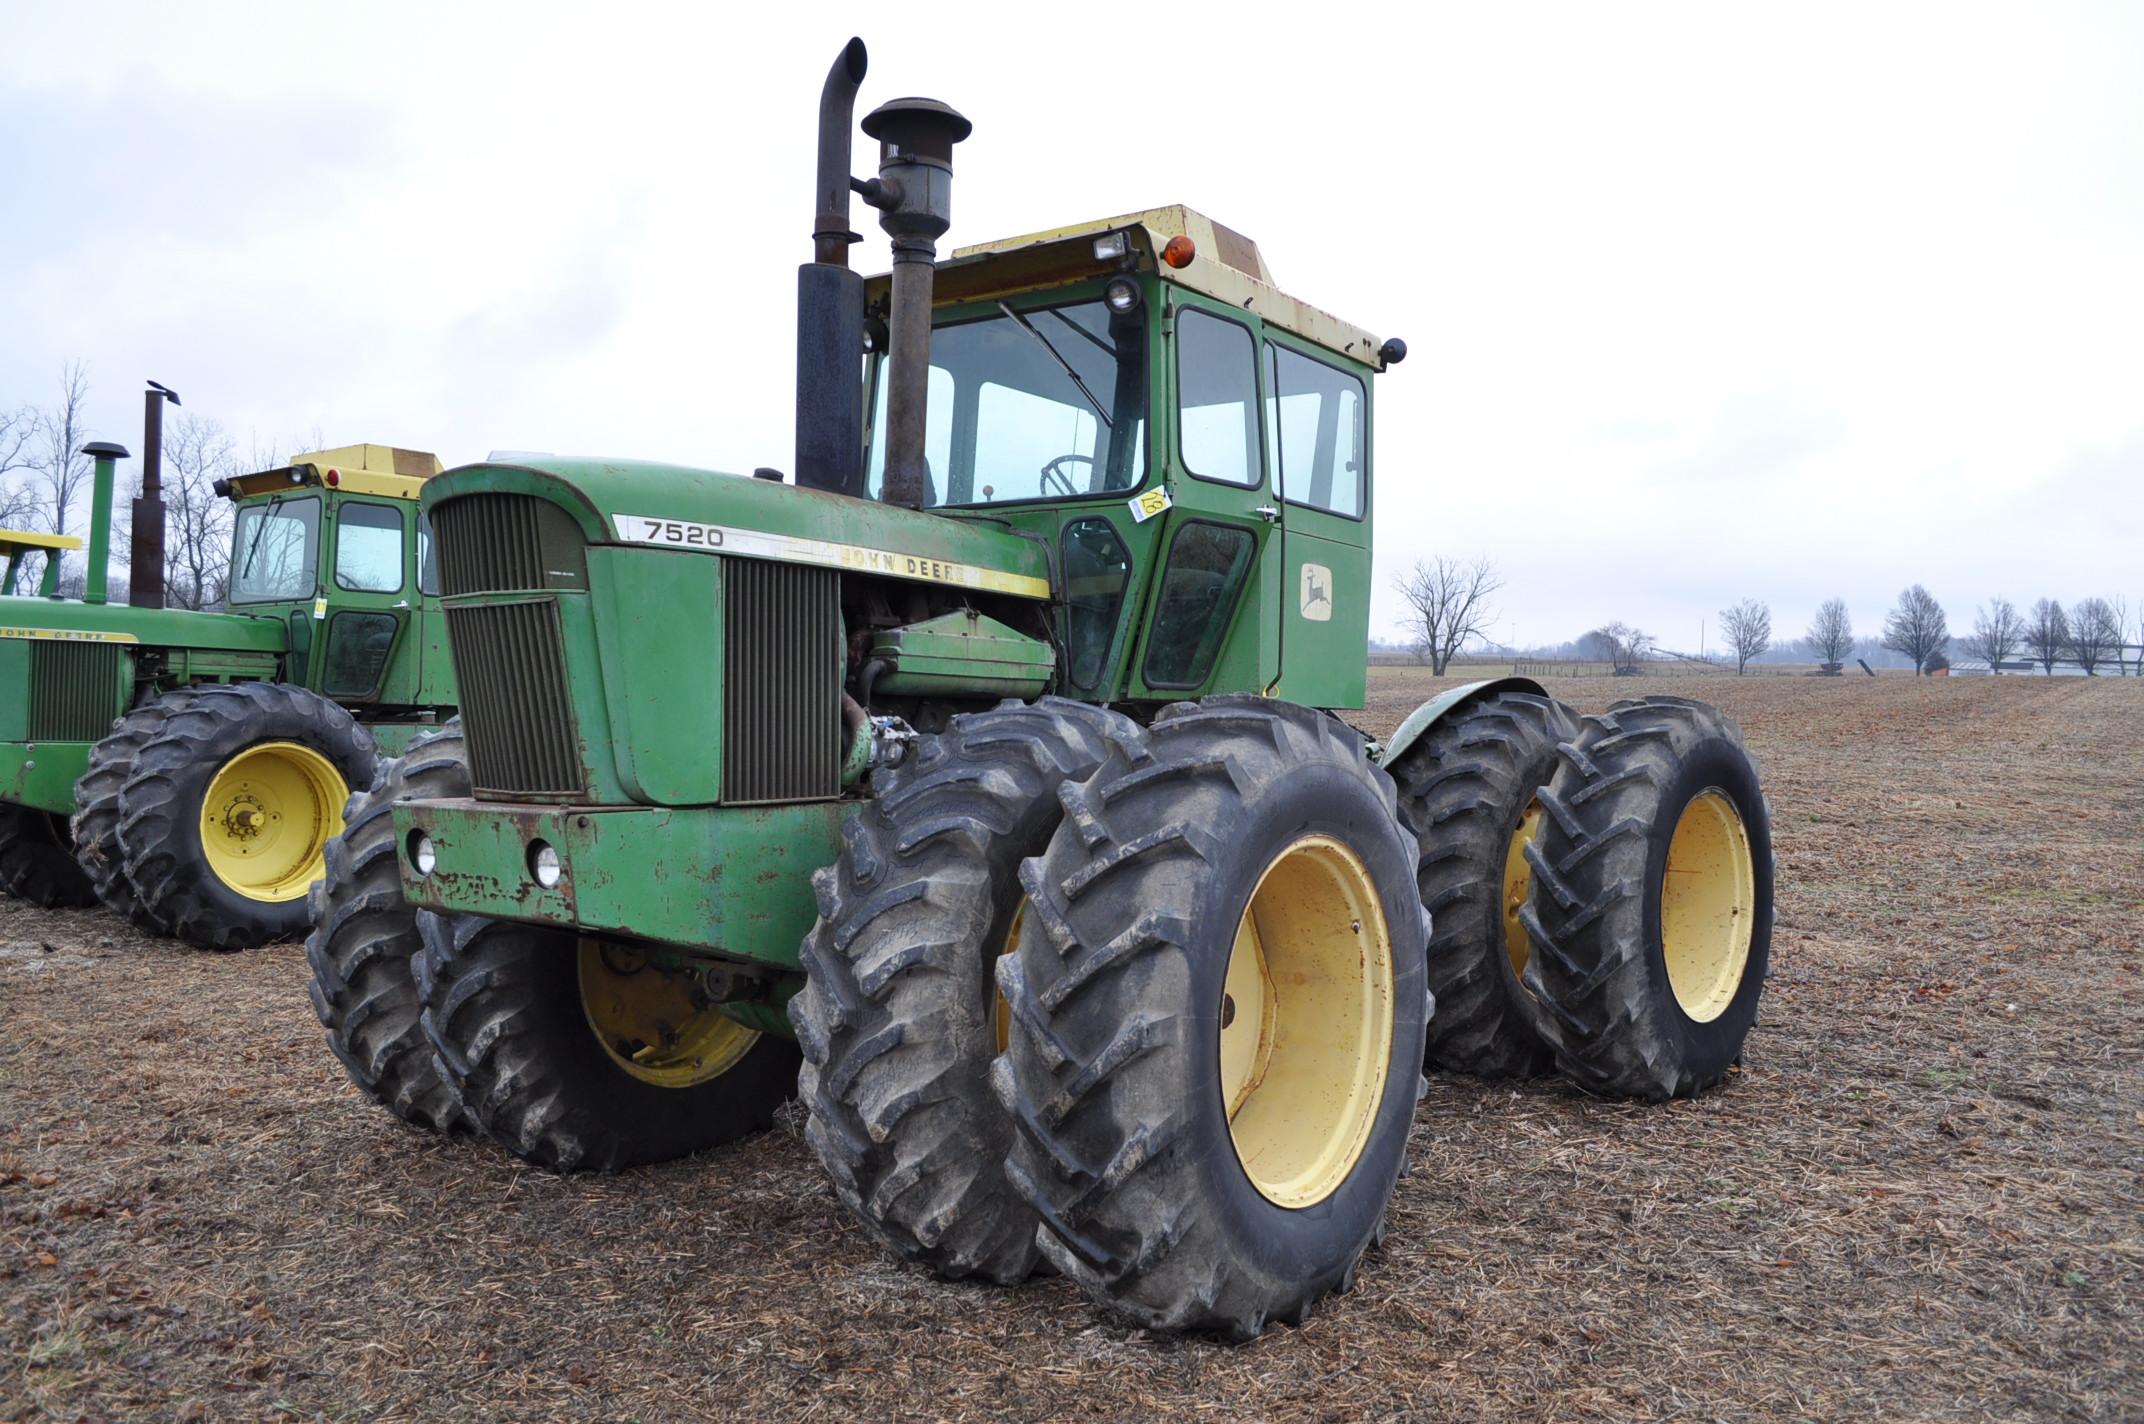 John Deere 7520 tractor, 4WD, diesel, 18.4-34 duals, original fenders, CHA, cab interior kit, 3